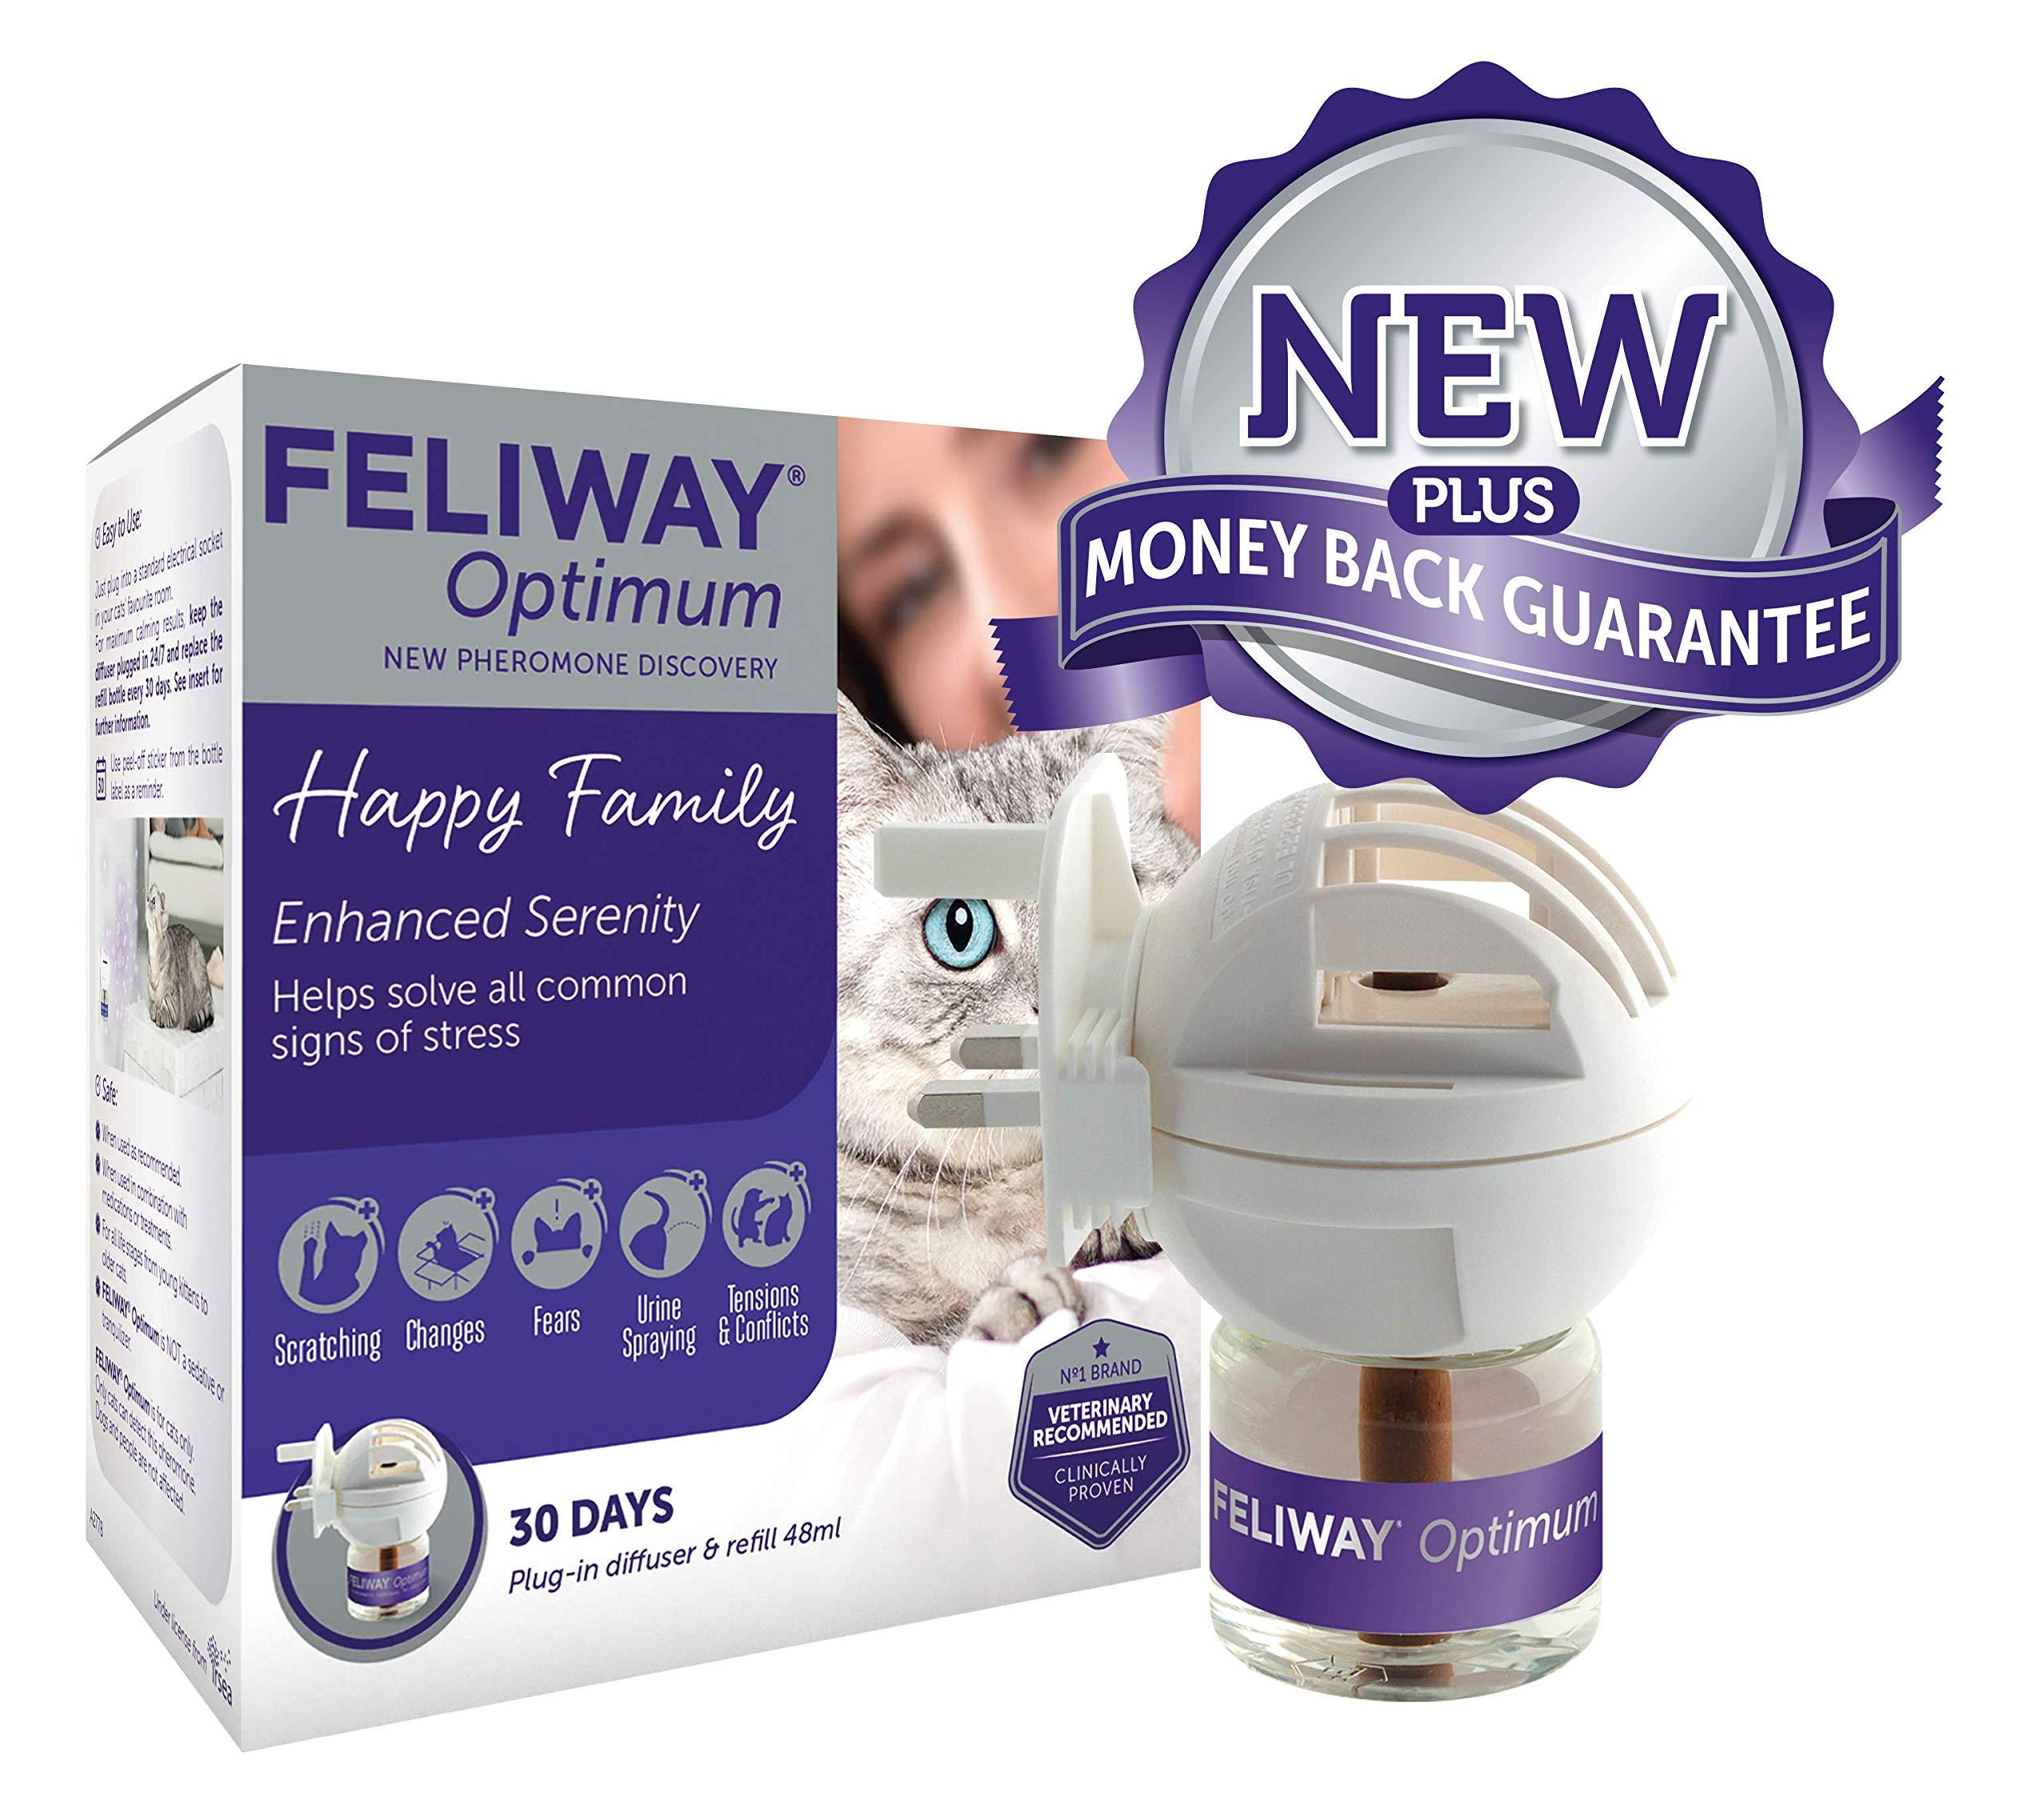 Feliway Optimum Diffuser Starter Kit and Refill, 48ml